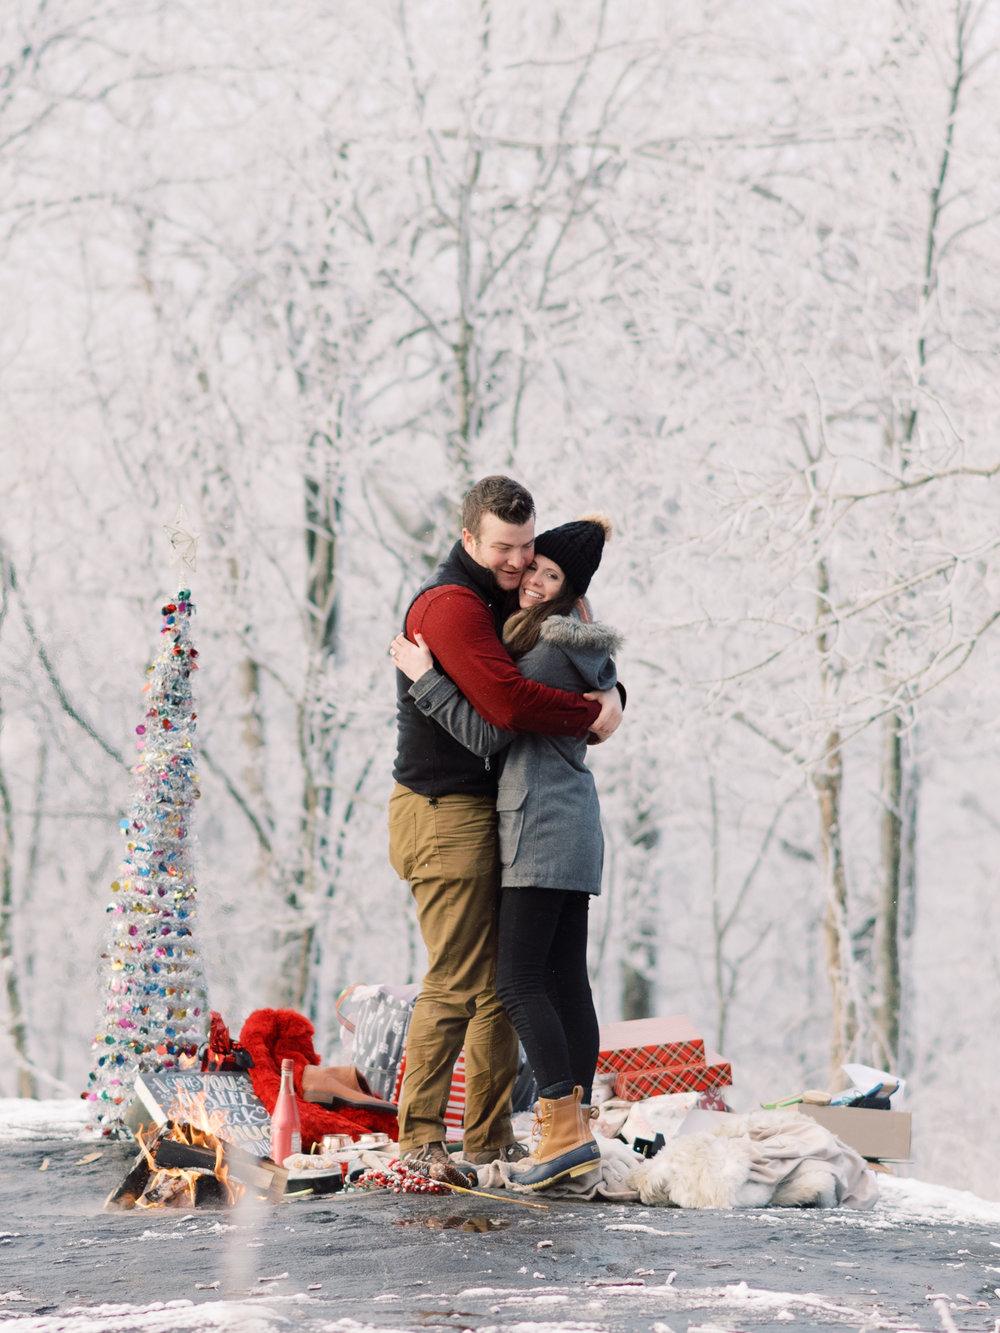 snowy-georgia-proposal-preachers-rock-atlanta-dahlonega-wedding-photographer-hannah-forsberg-fine-art-film-15.jpg